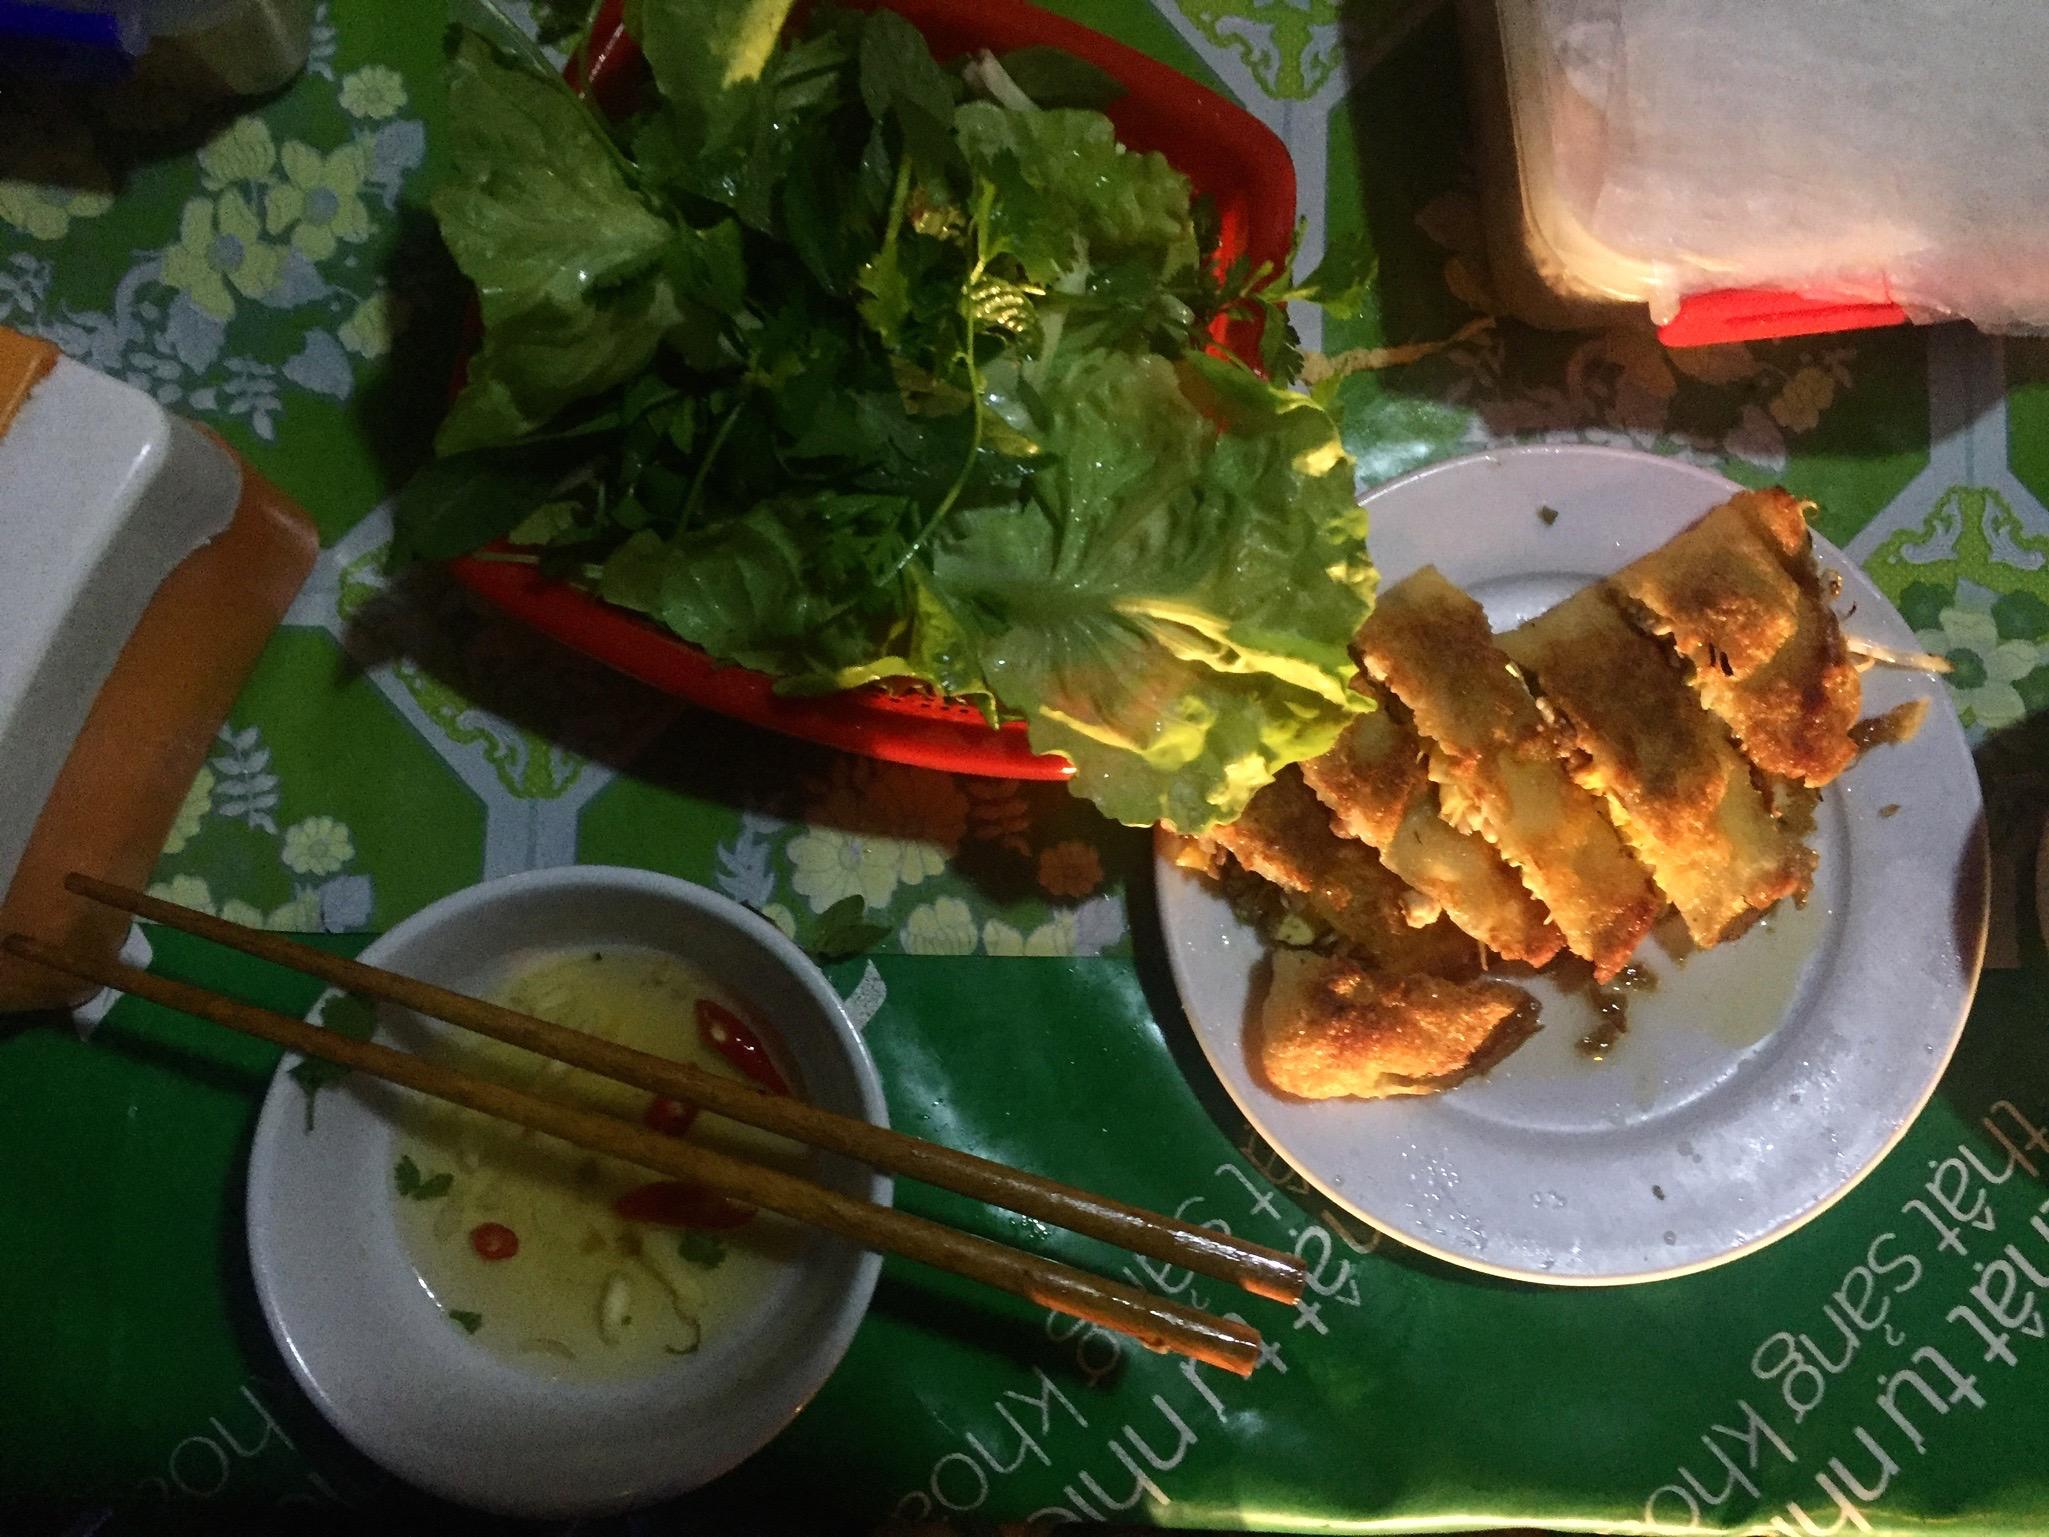 Banh Xeo (Vietnamese crepe), Cat Ba Island, Vietnam